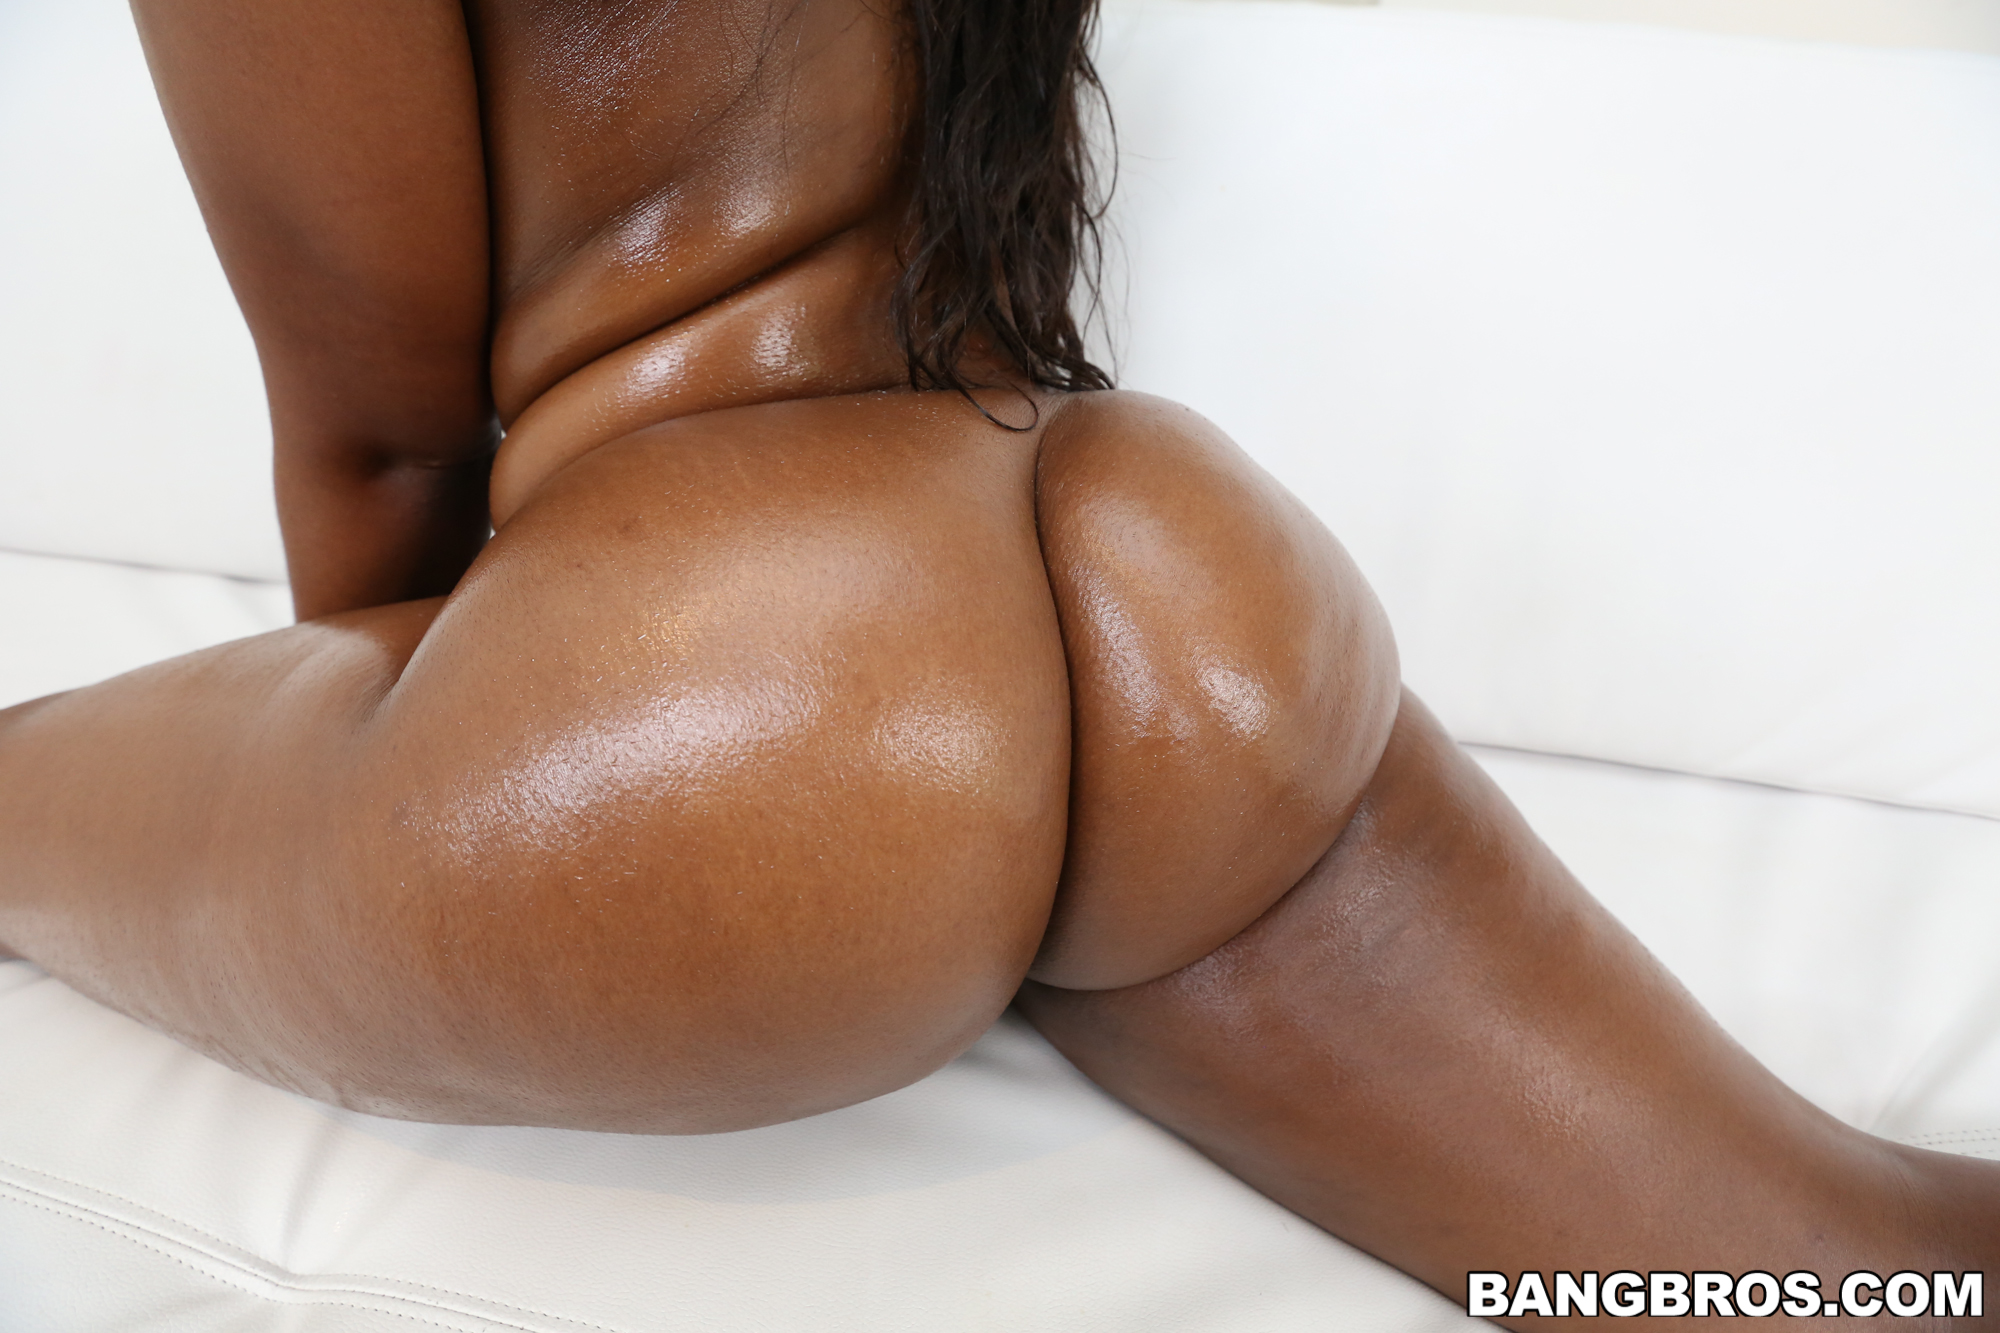 Nina Rotti muestra su conchita de chocolate amargo